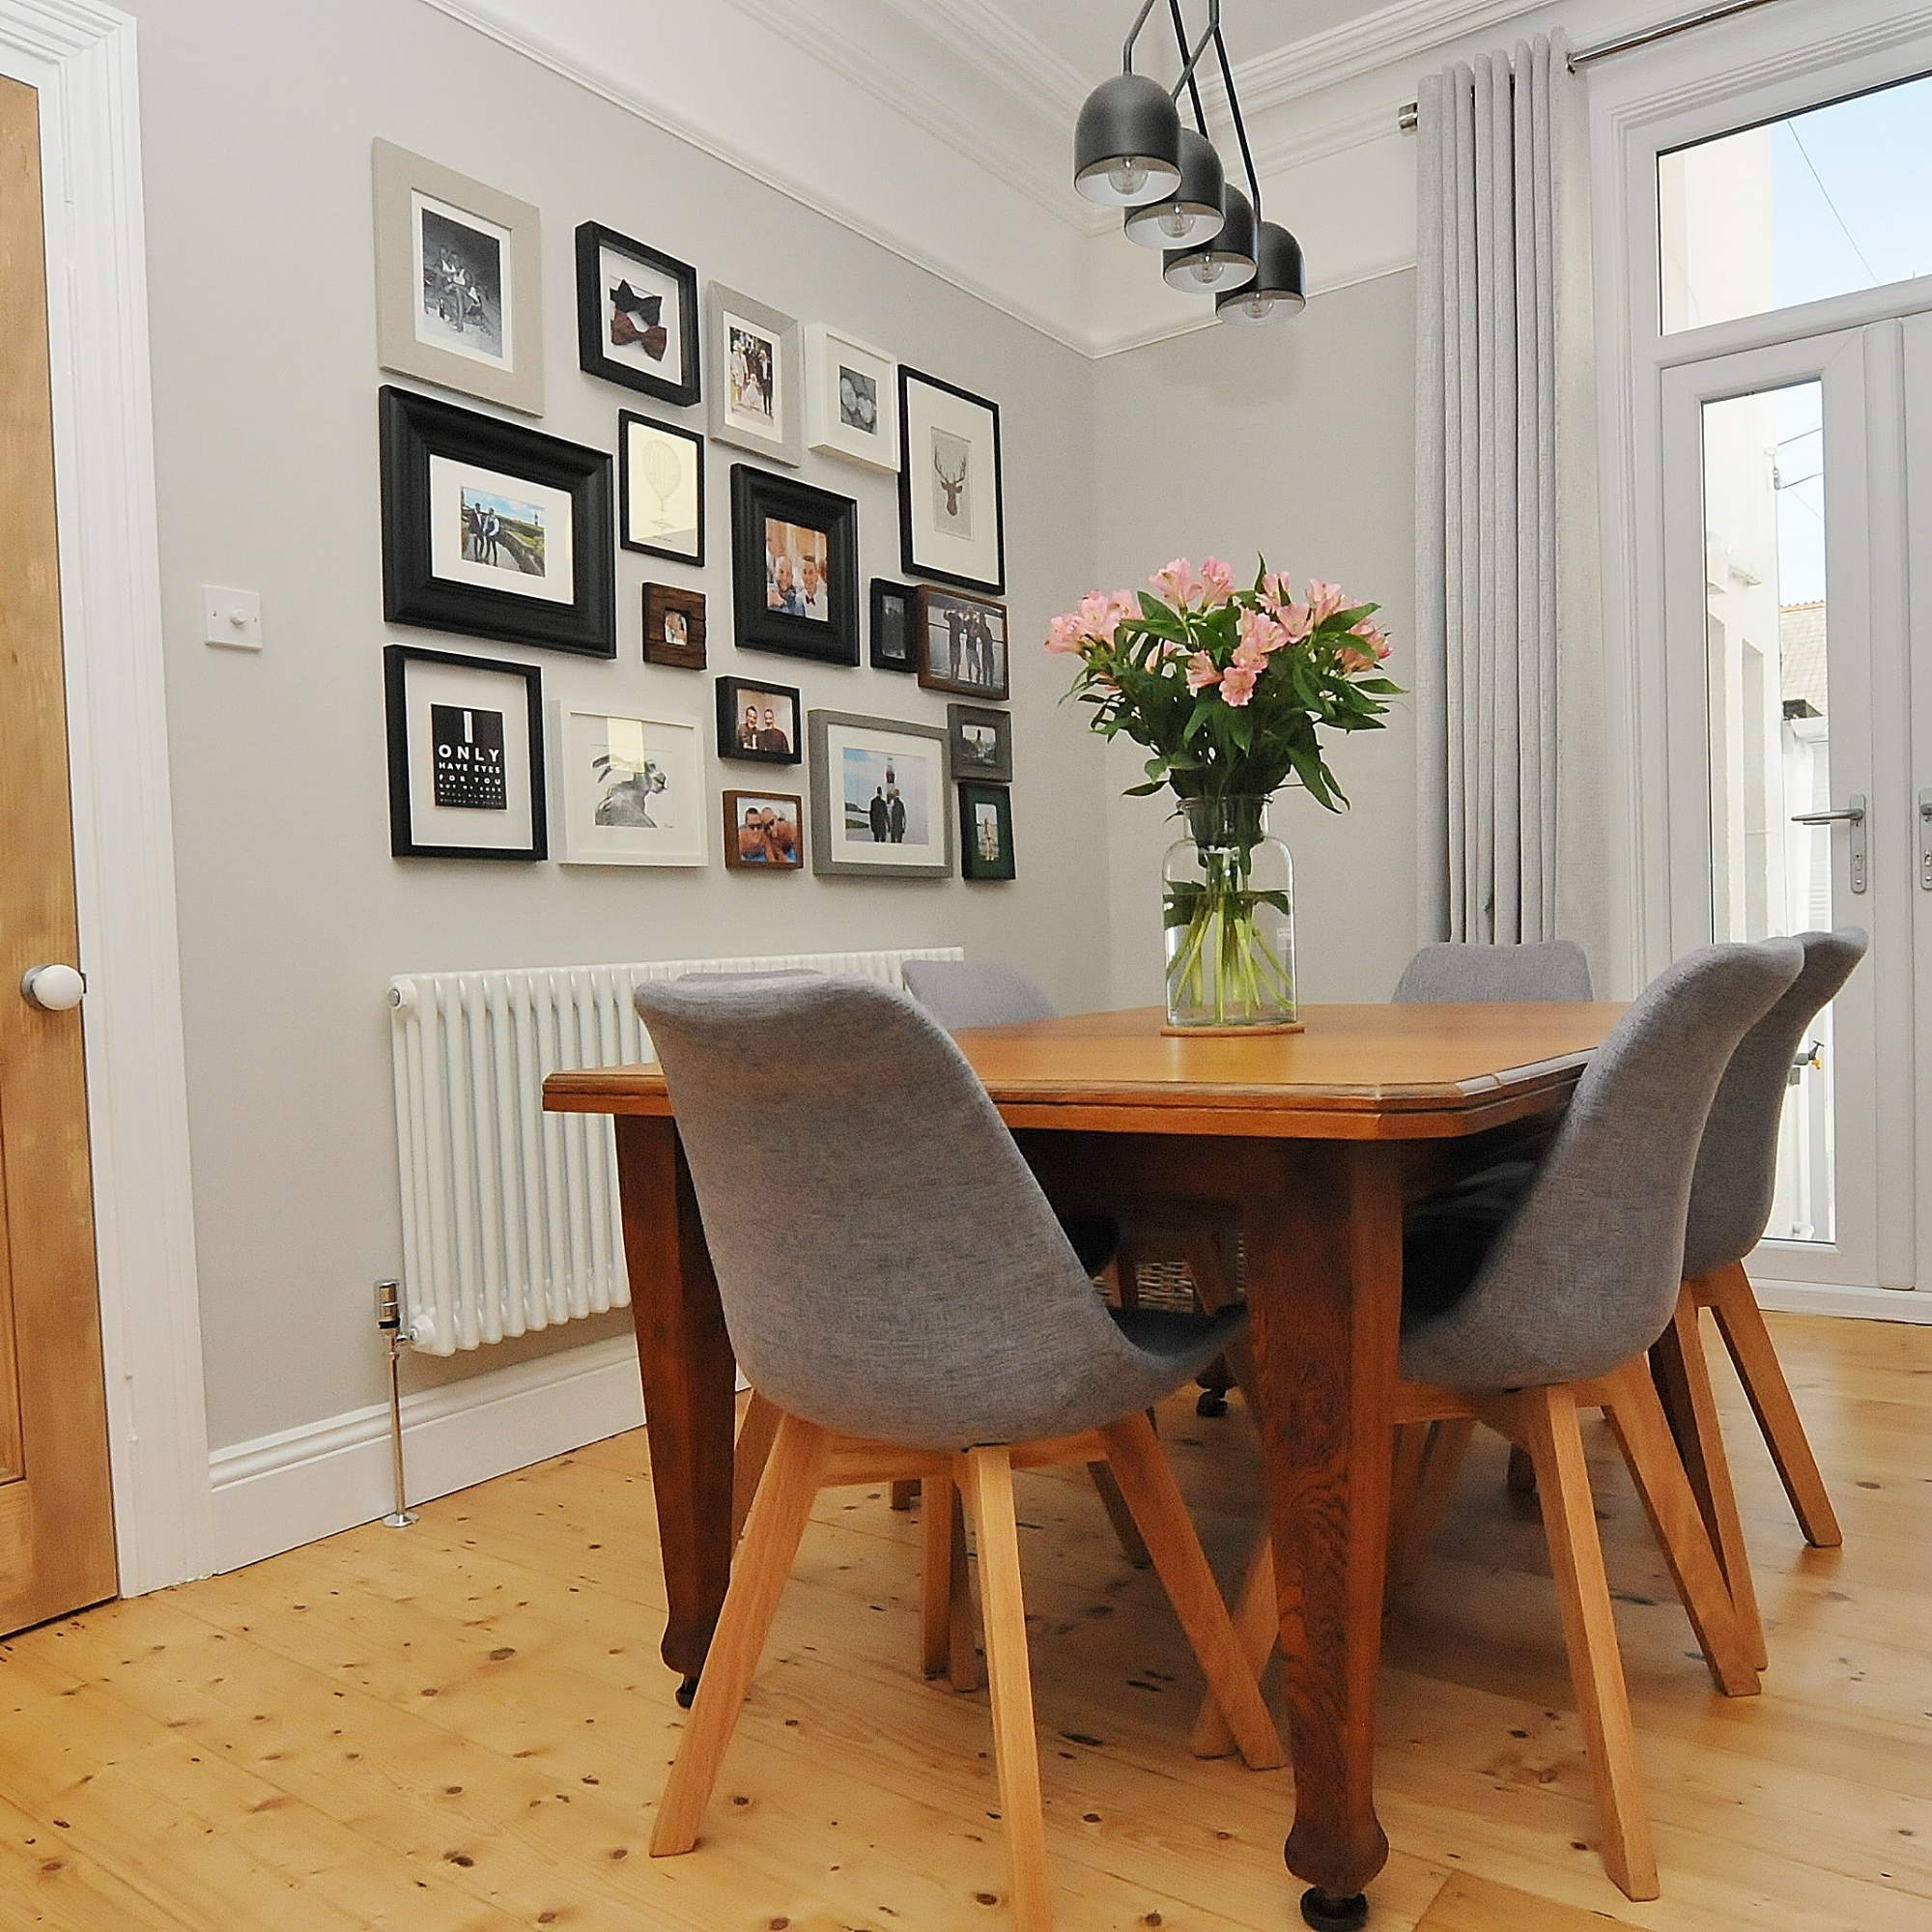 interior-design-painter-decorator-plymouth-dining-room-inspiration